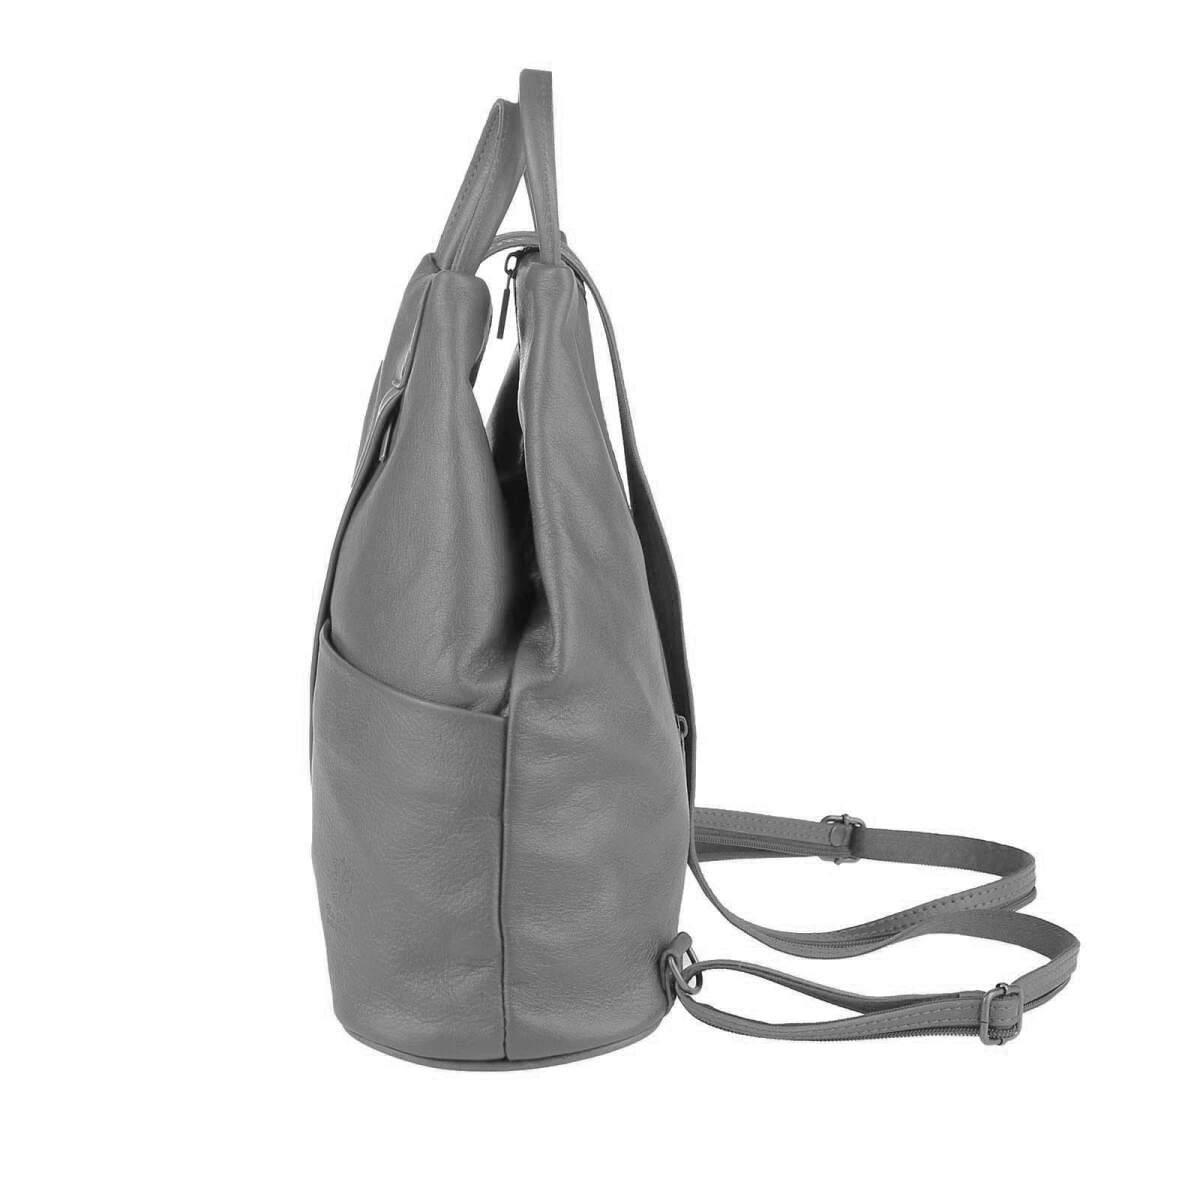 obc damen echt leder rucksack schultertasche grau schwarz 69 95. Black Bedroom Furniture Sets. Home Design Ideas